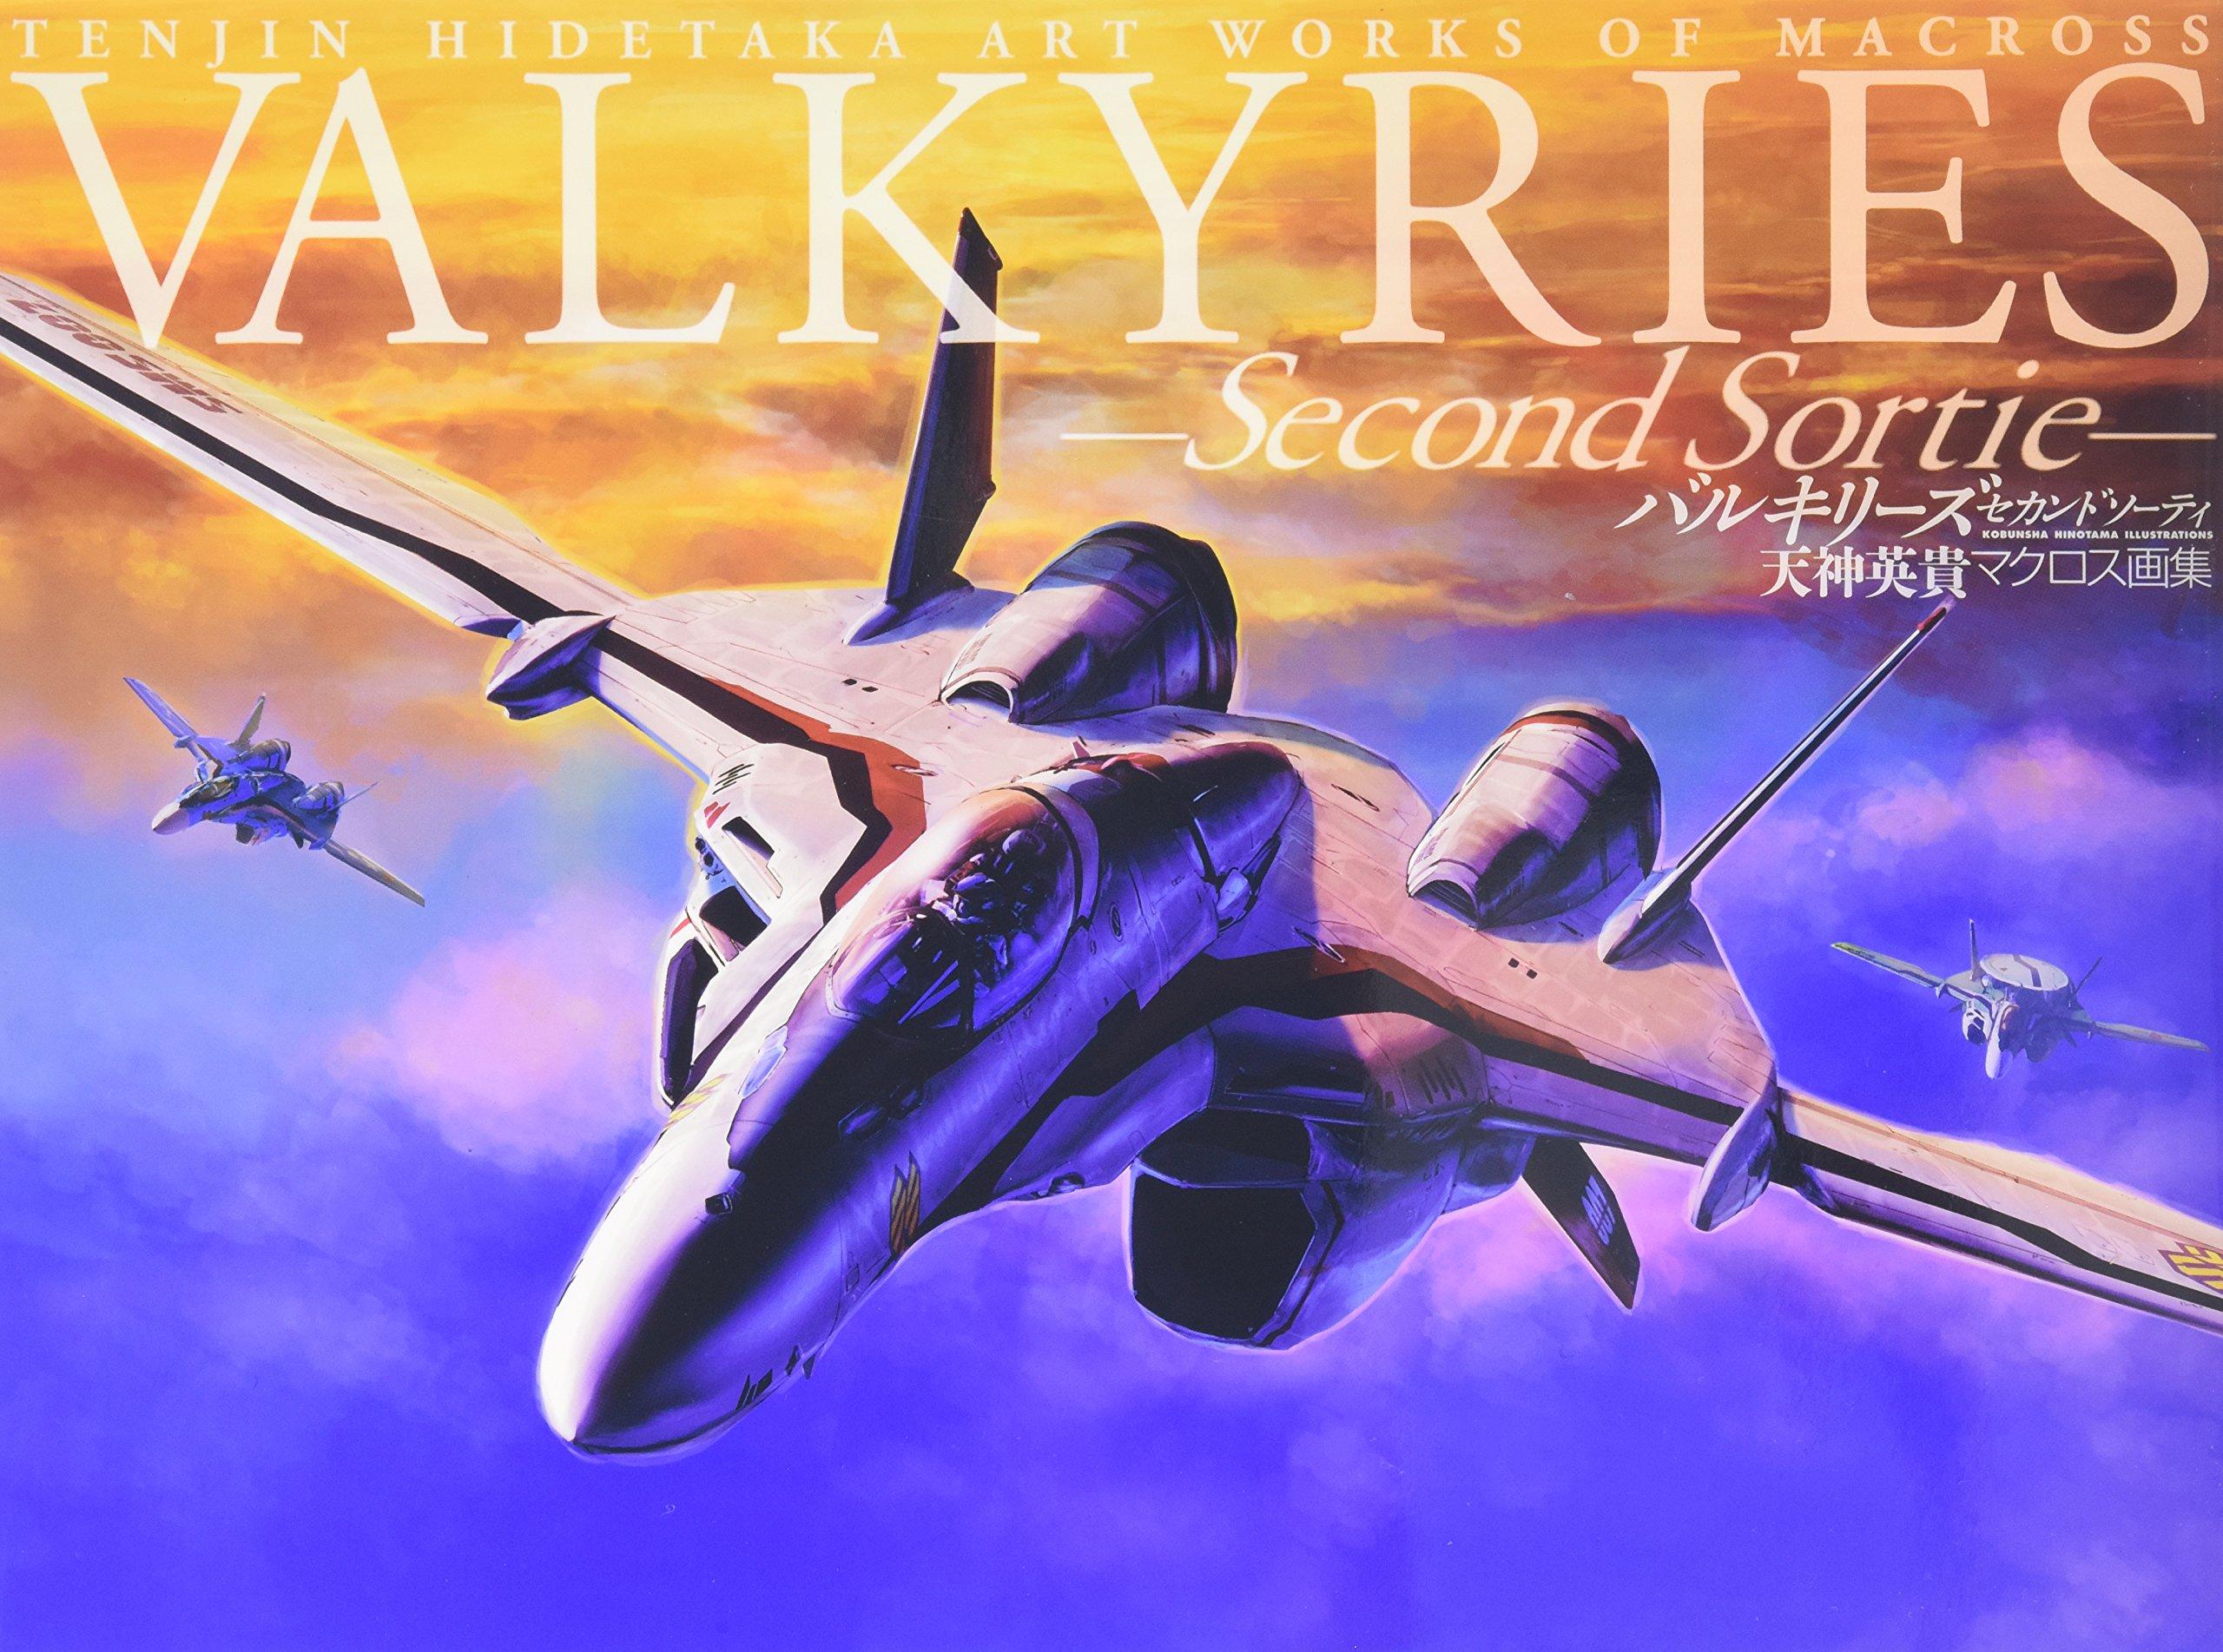 Read Online VALKYRIES - Second Sortie - Tenjin Hidetaka's Art Works of Macross (Japan Import) pdf epub